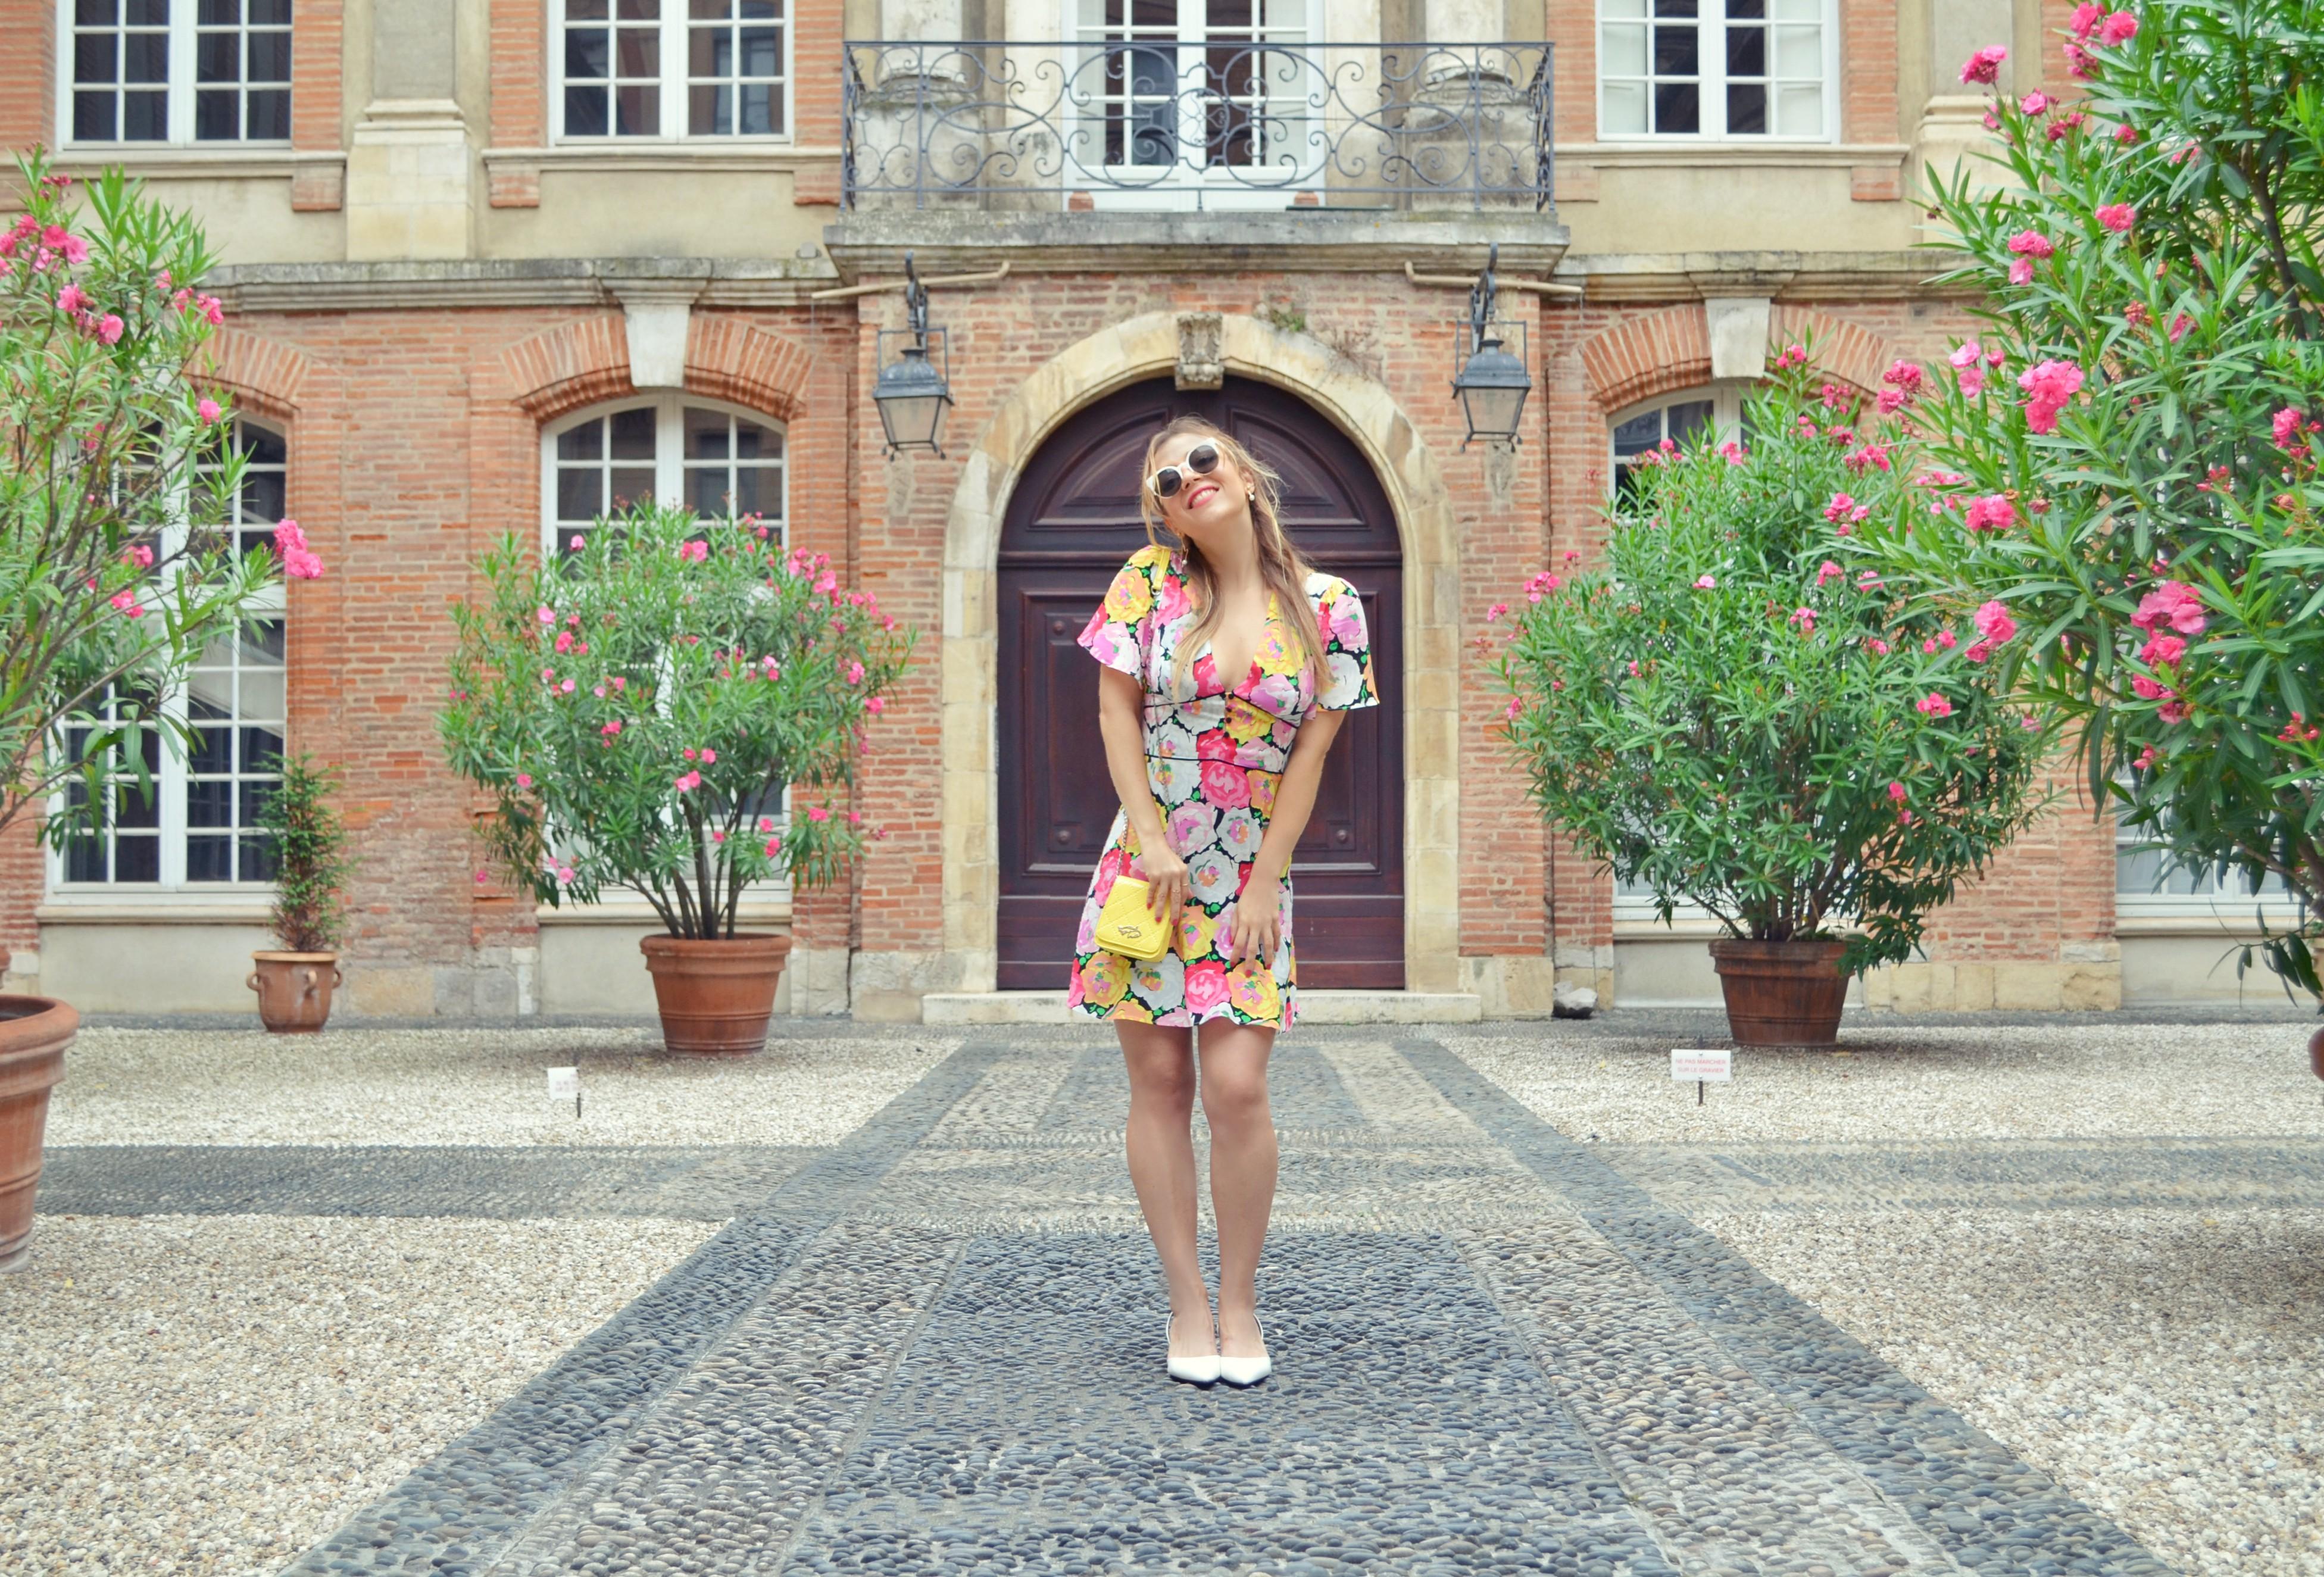 Blog-de-moda-ChicAdicta-fashionista-influencer-Chic-Adicta-flower-dress-look-vestidos-Zara-blog-de-viajes-PiensaenChic-Piensa-en-Chic